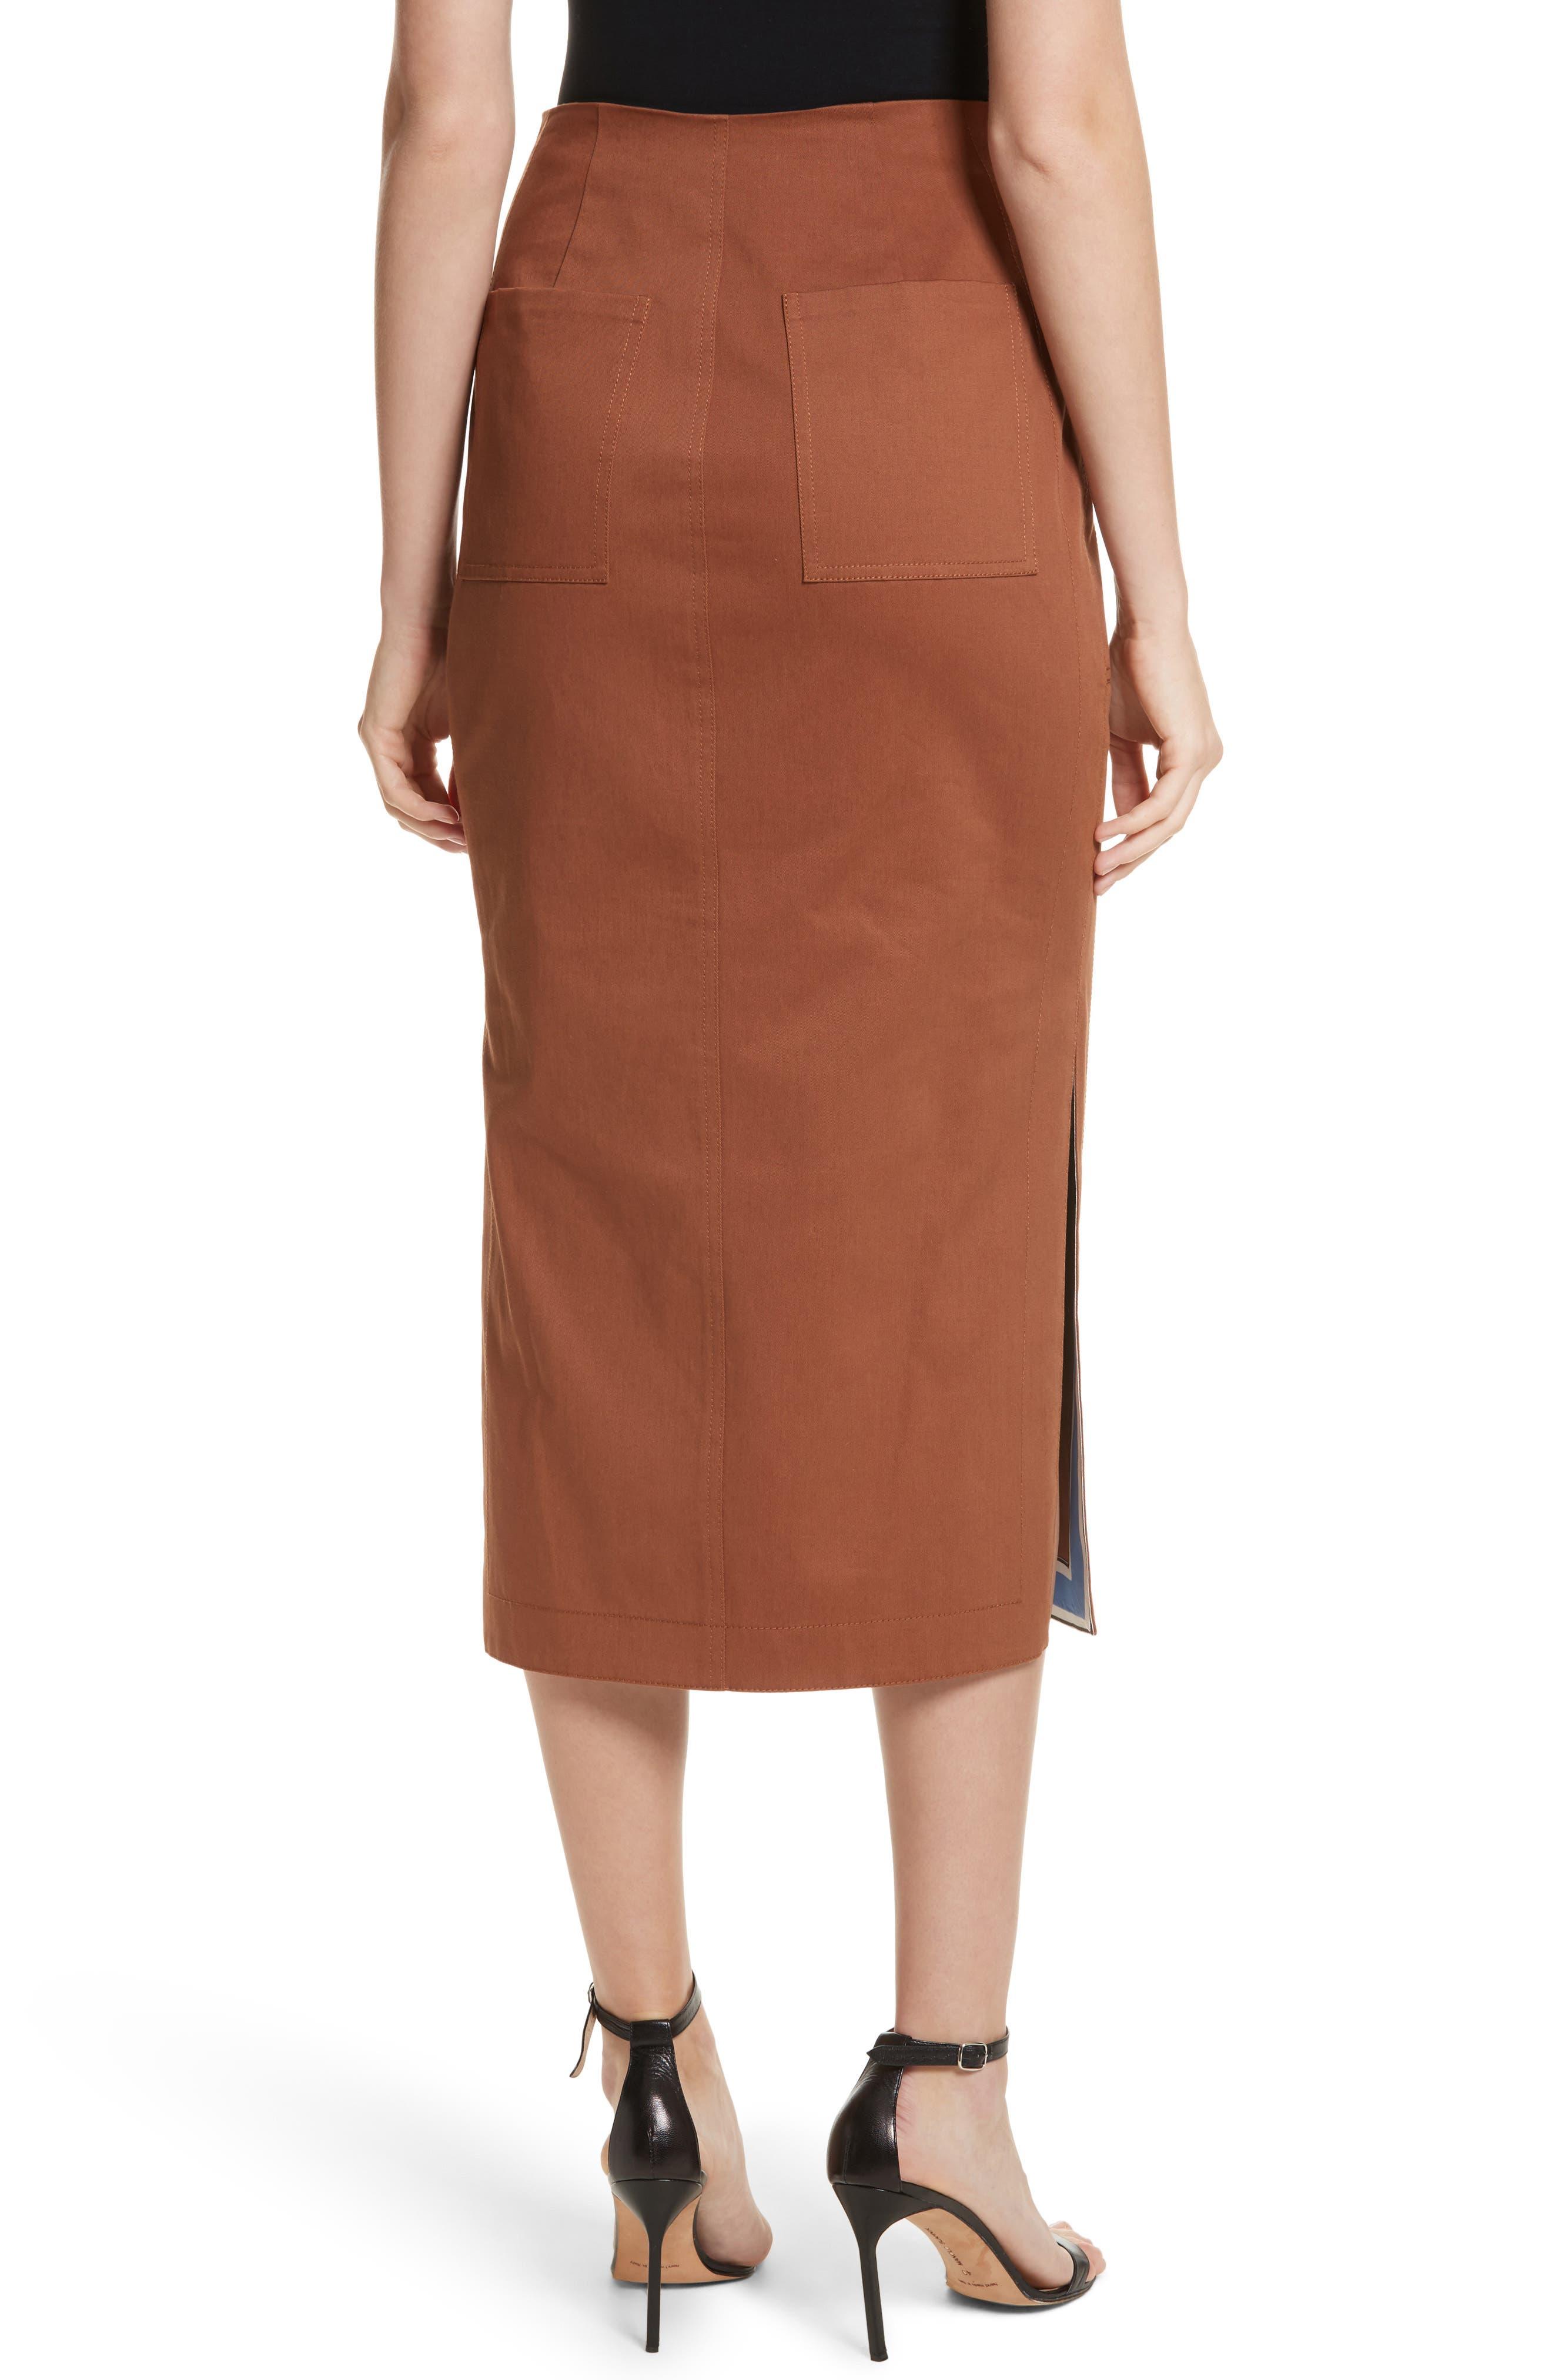 Diane von Furstenberg Midi Twill Pencil Skirt,                             Alternate thumbnail 2, color,                             203